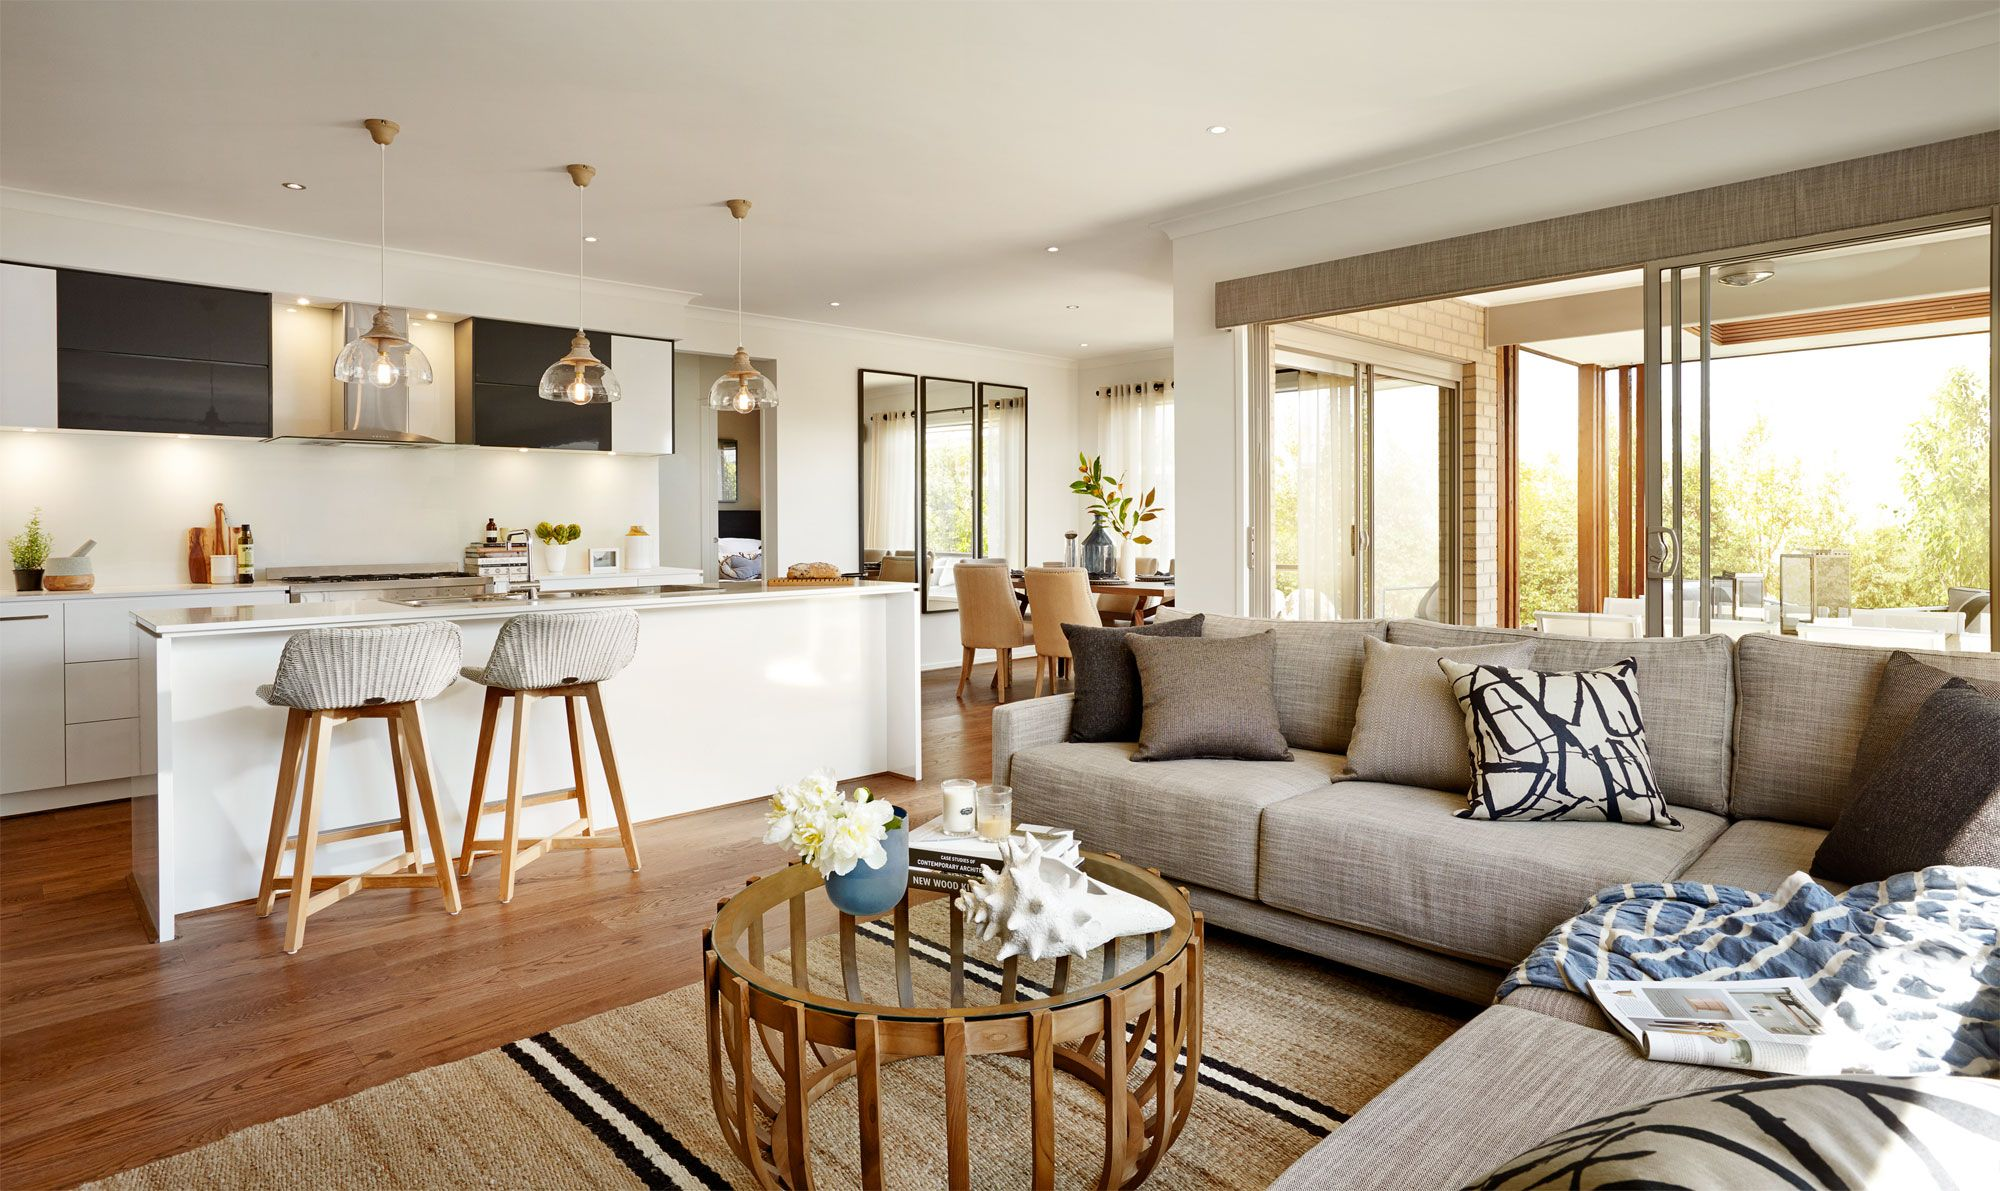 Carlisle Homes: Laguna 26 - Featured at The Avenue Estate | Kitchen ...